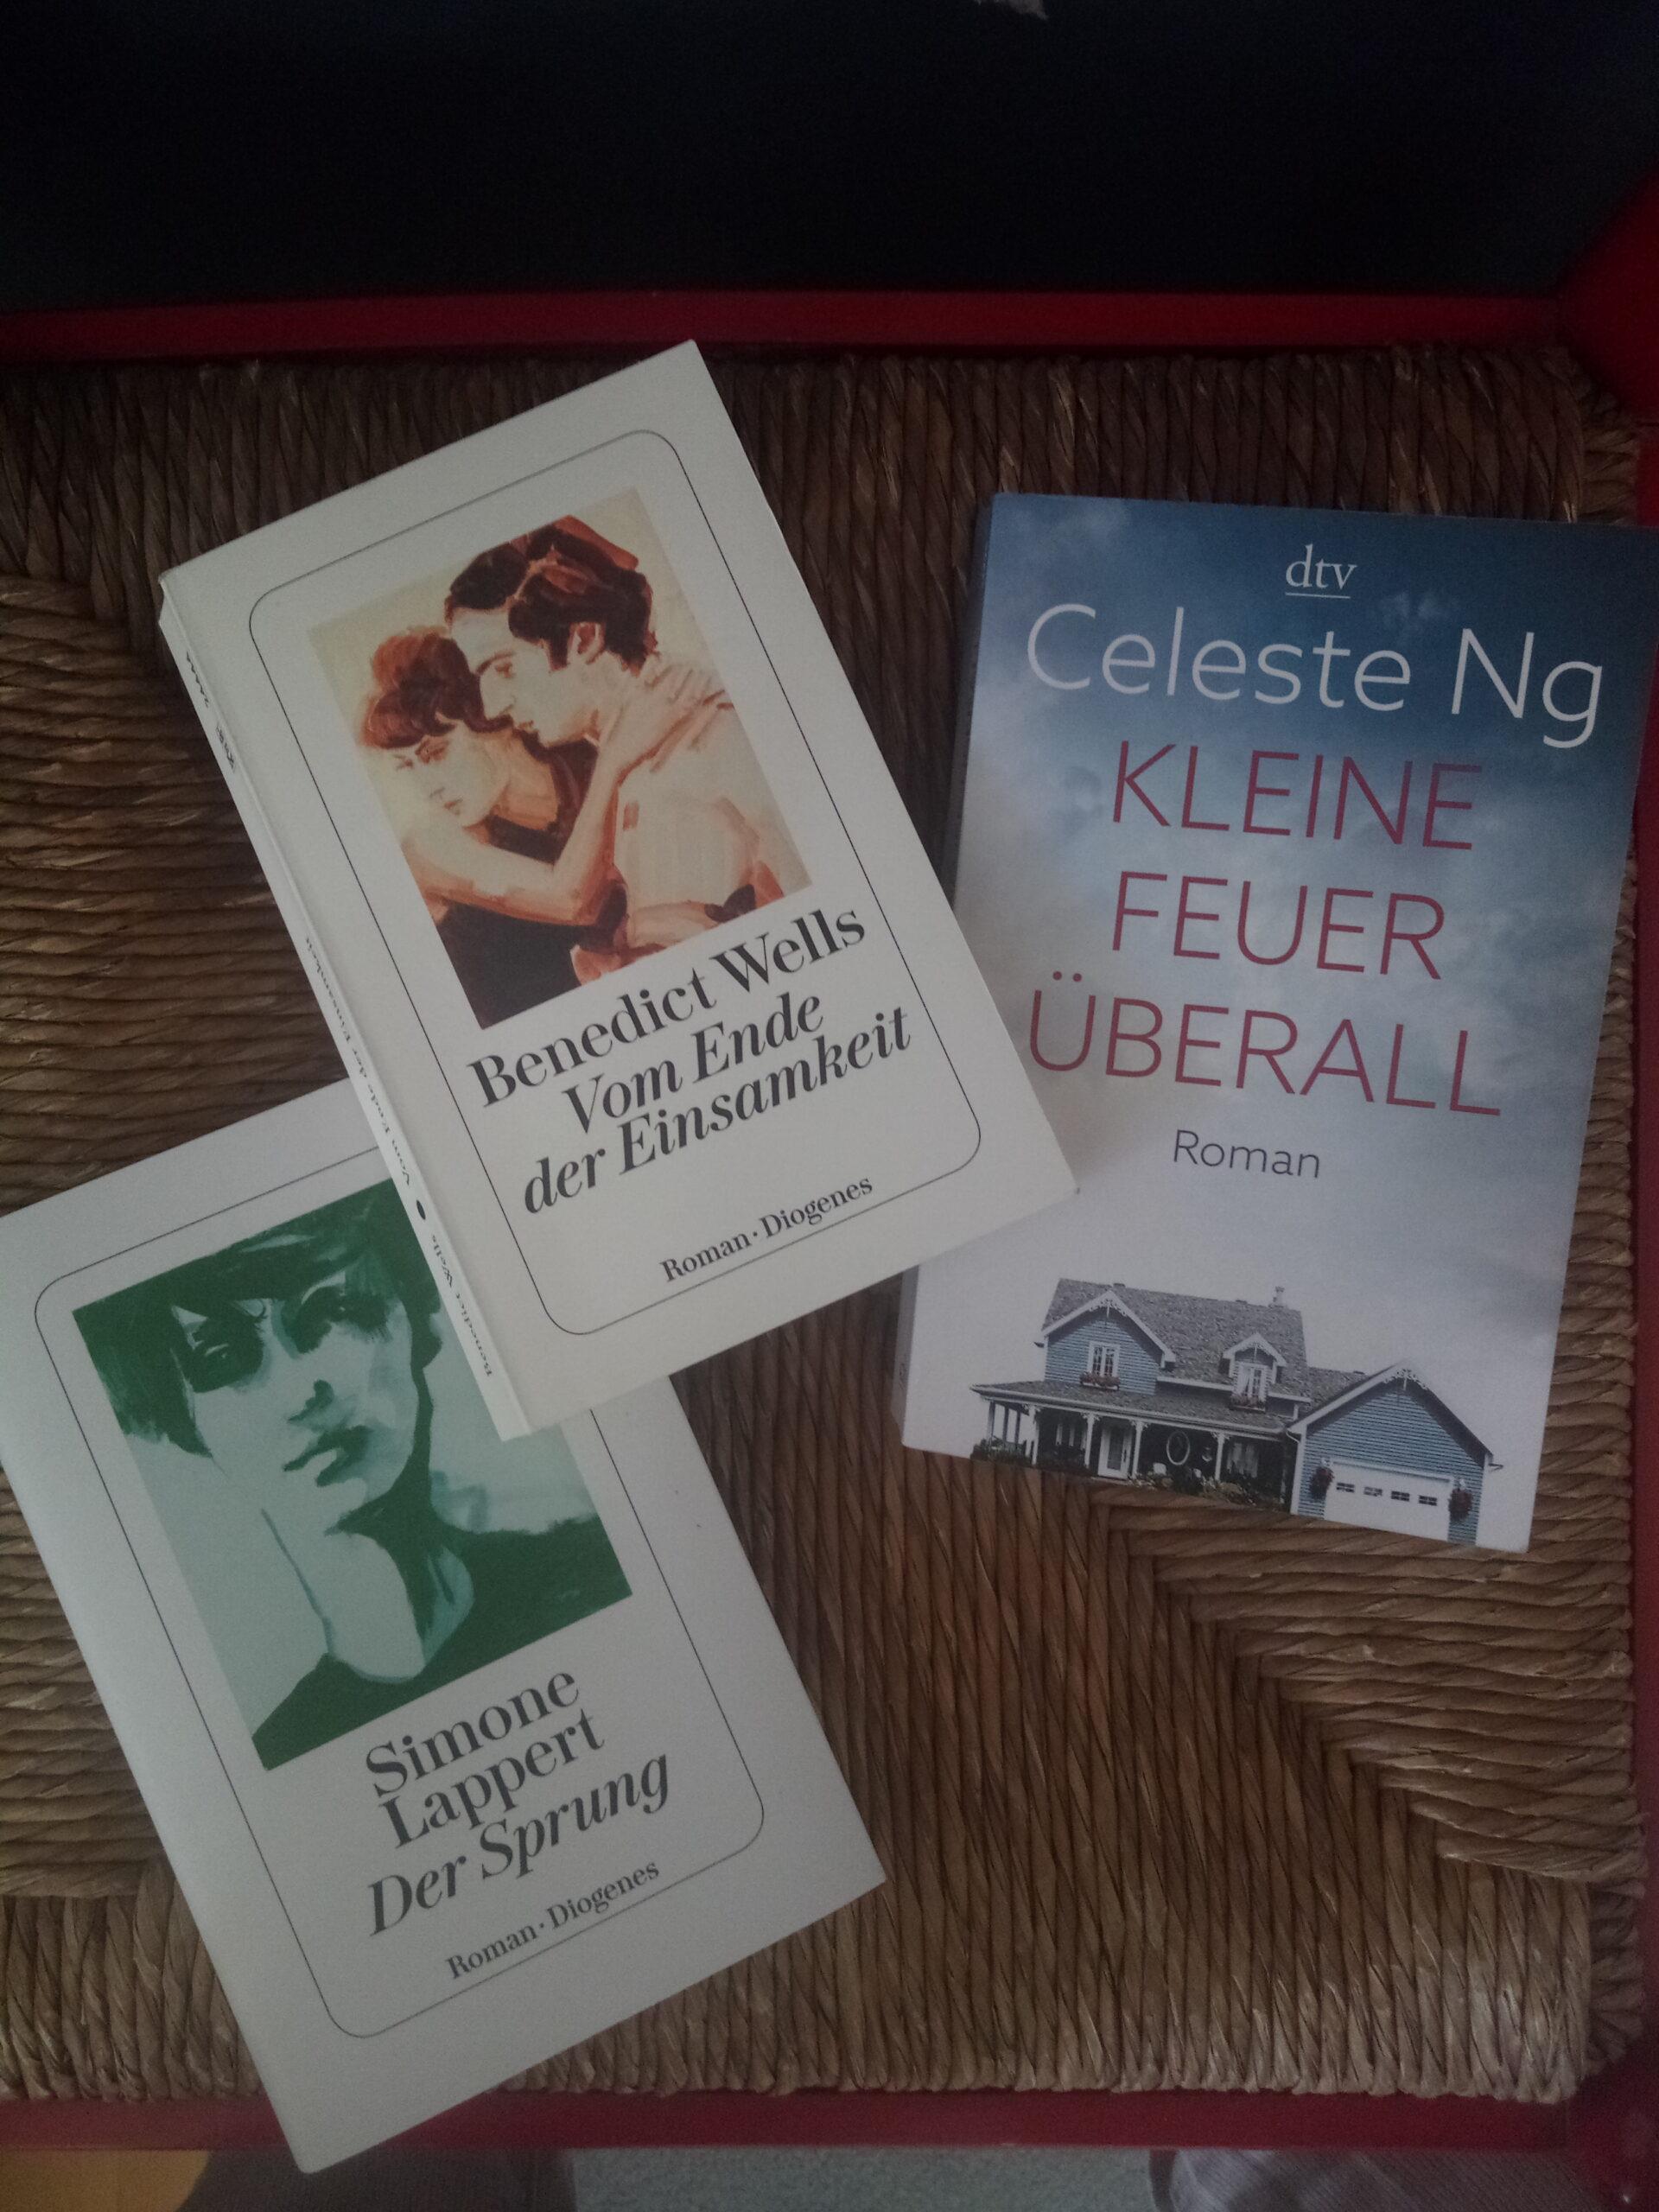 Bücher von Benedict Wells, Celeste Ng, Simone Lappert